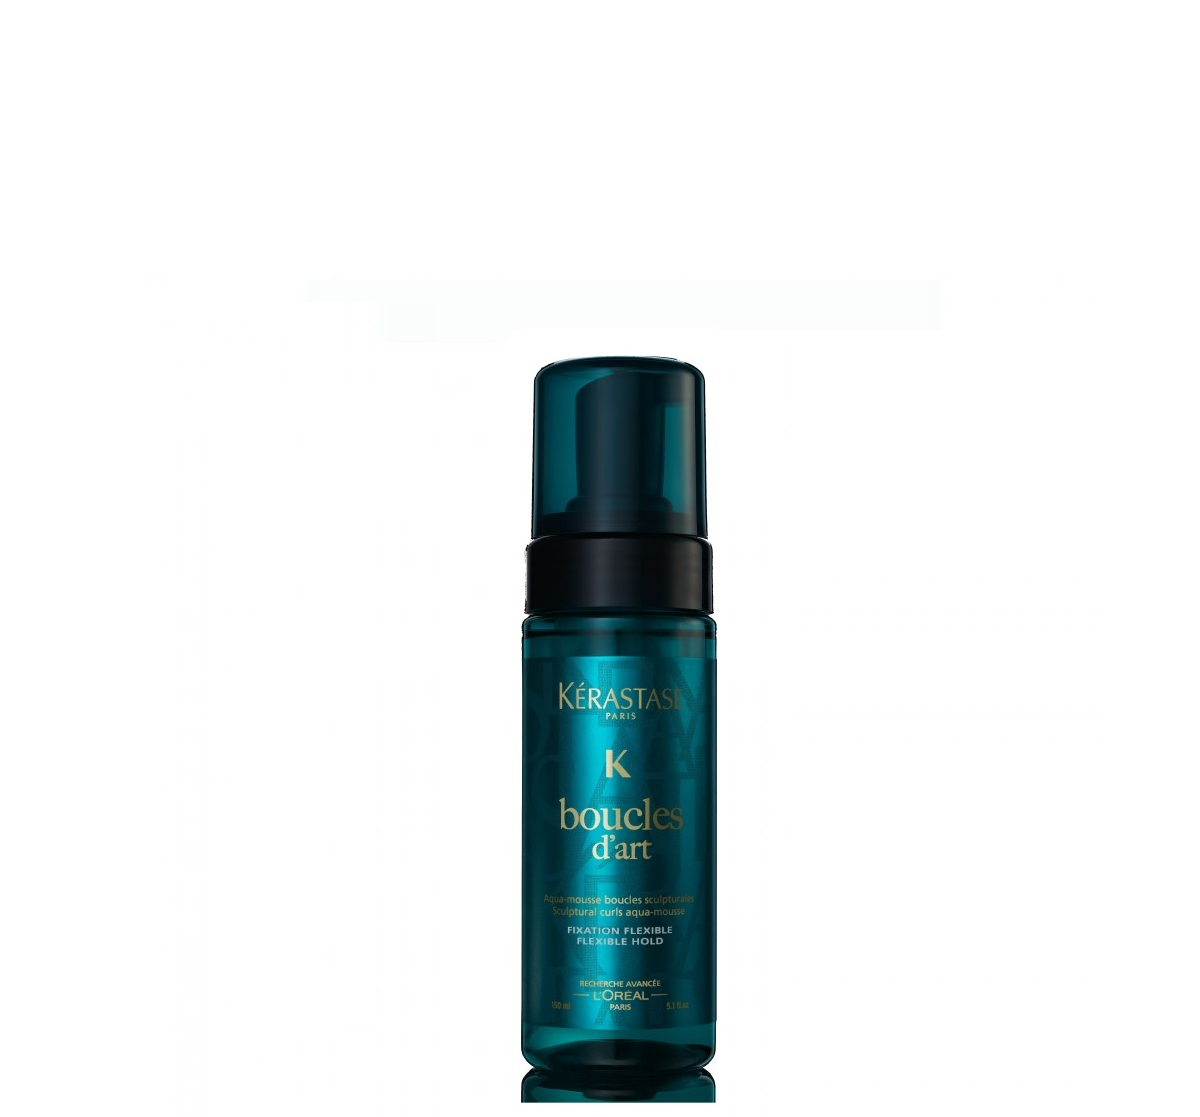 Plaukų putos Kerastase Boucles d'art aqua-mousse 150ml-0